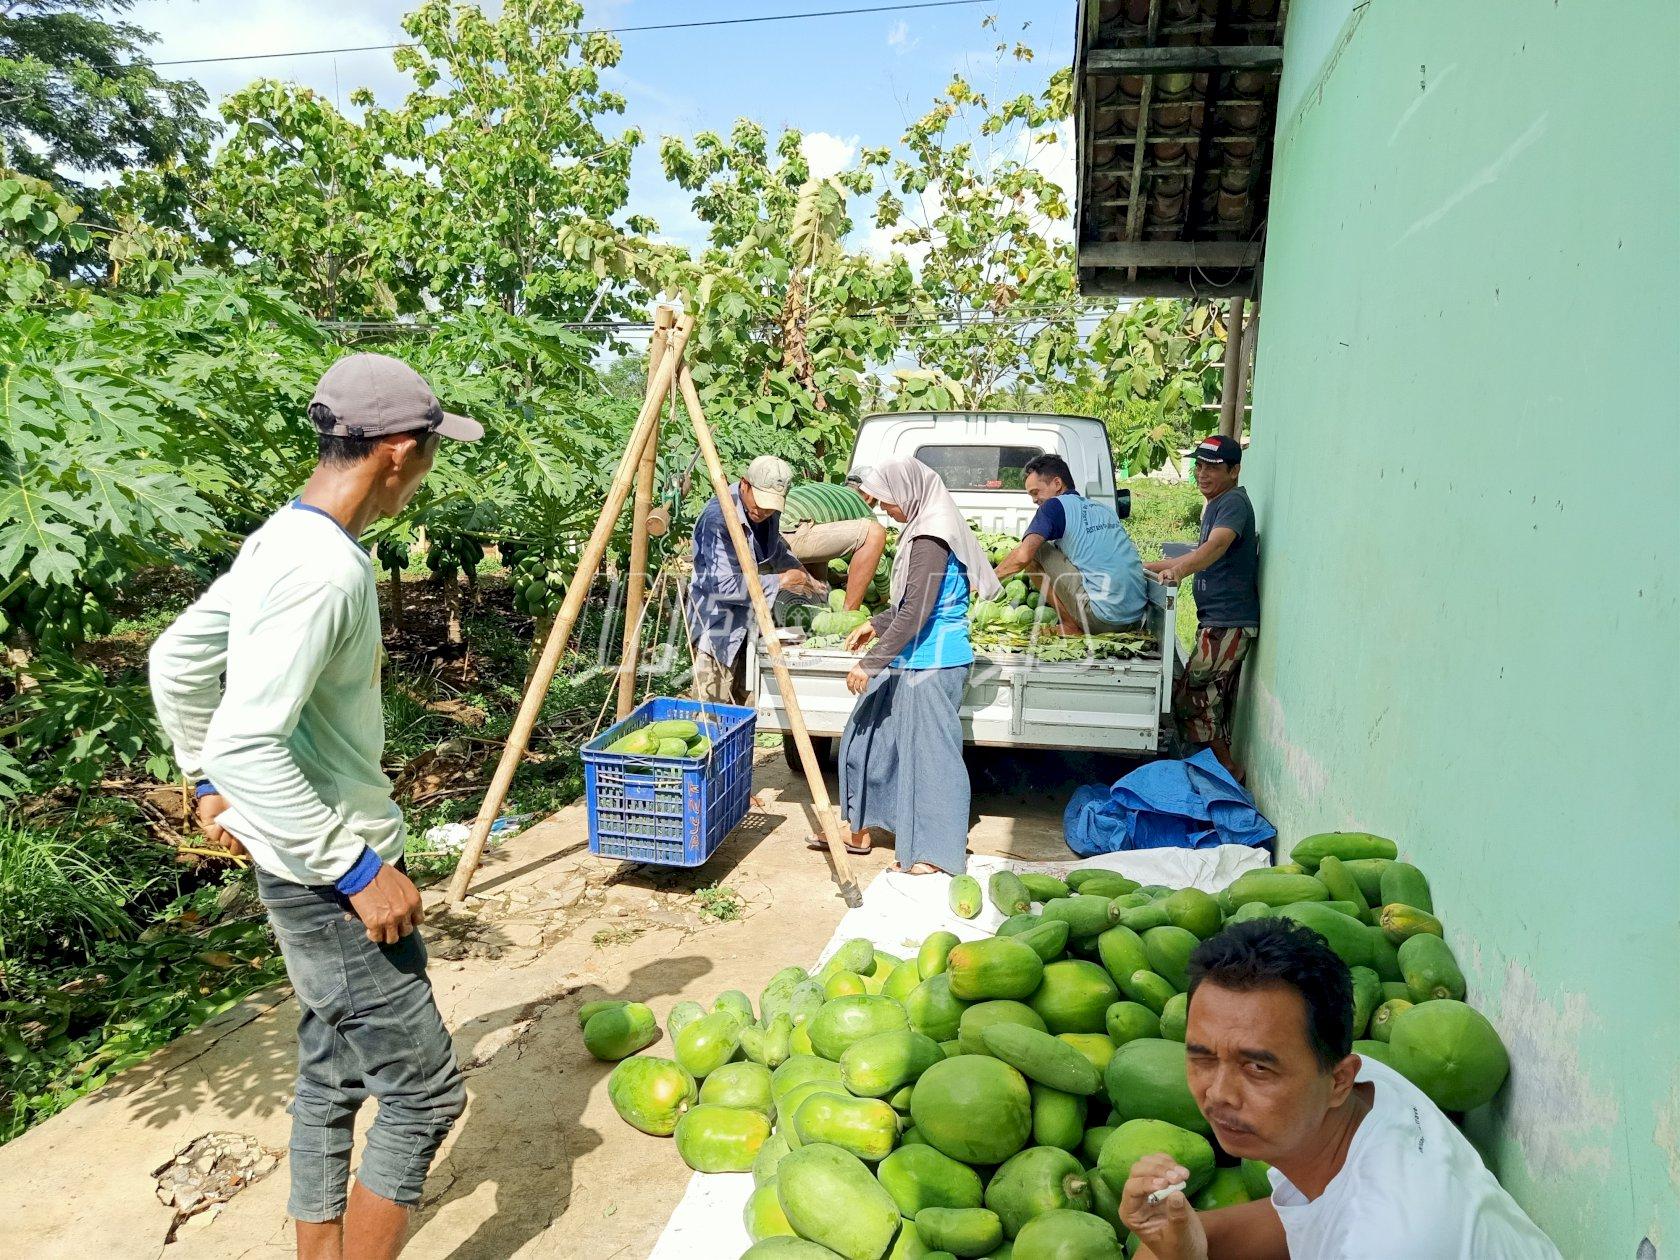 Lahan Asimilasi & Edukasi Rutan Purworejo Panen Pepaya Calina